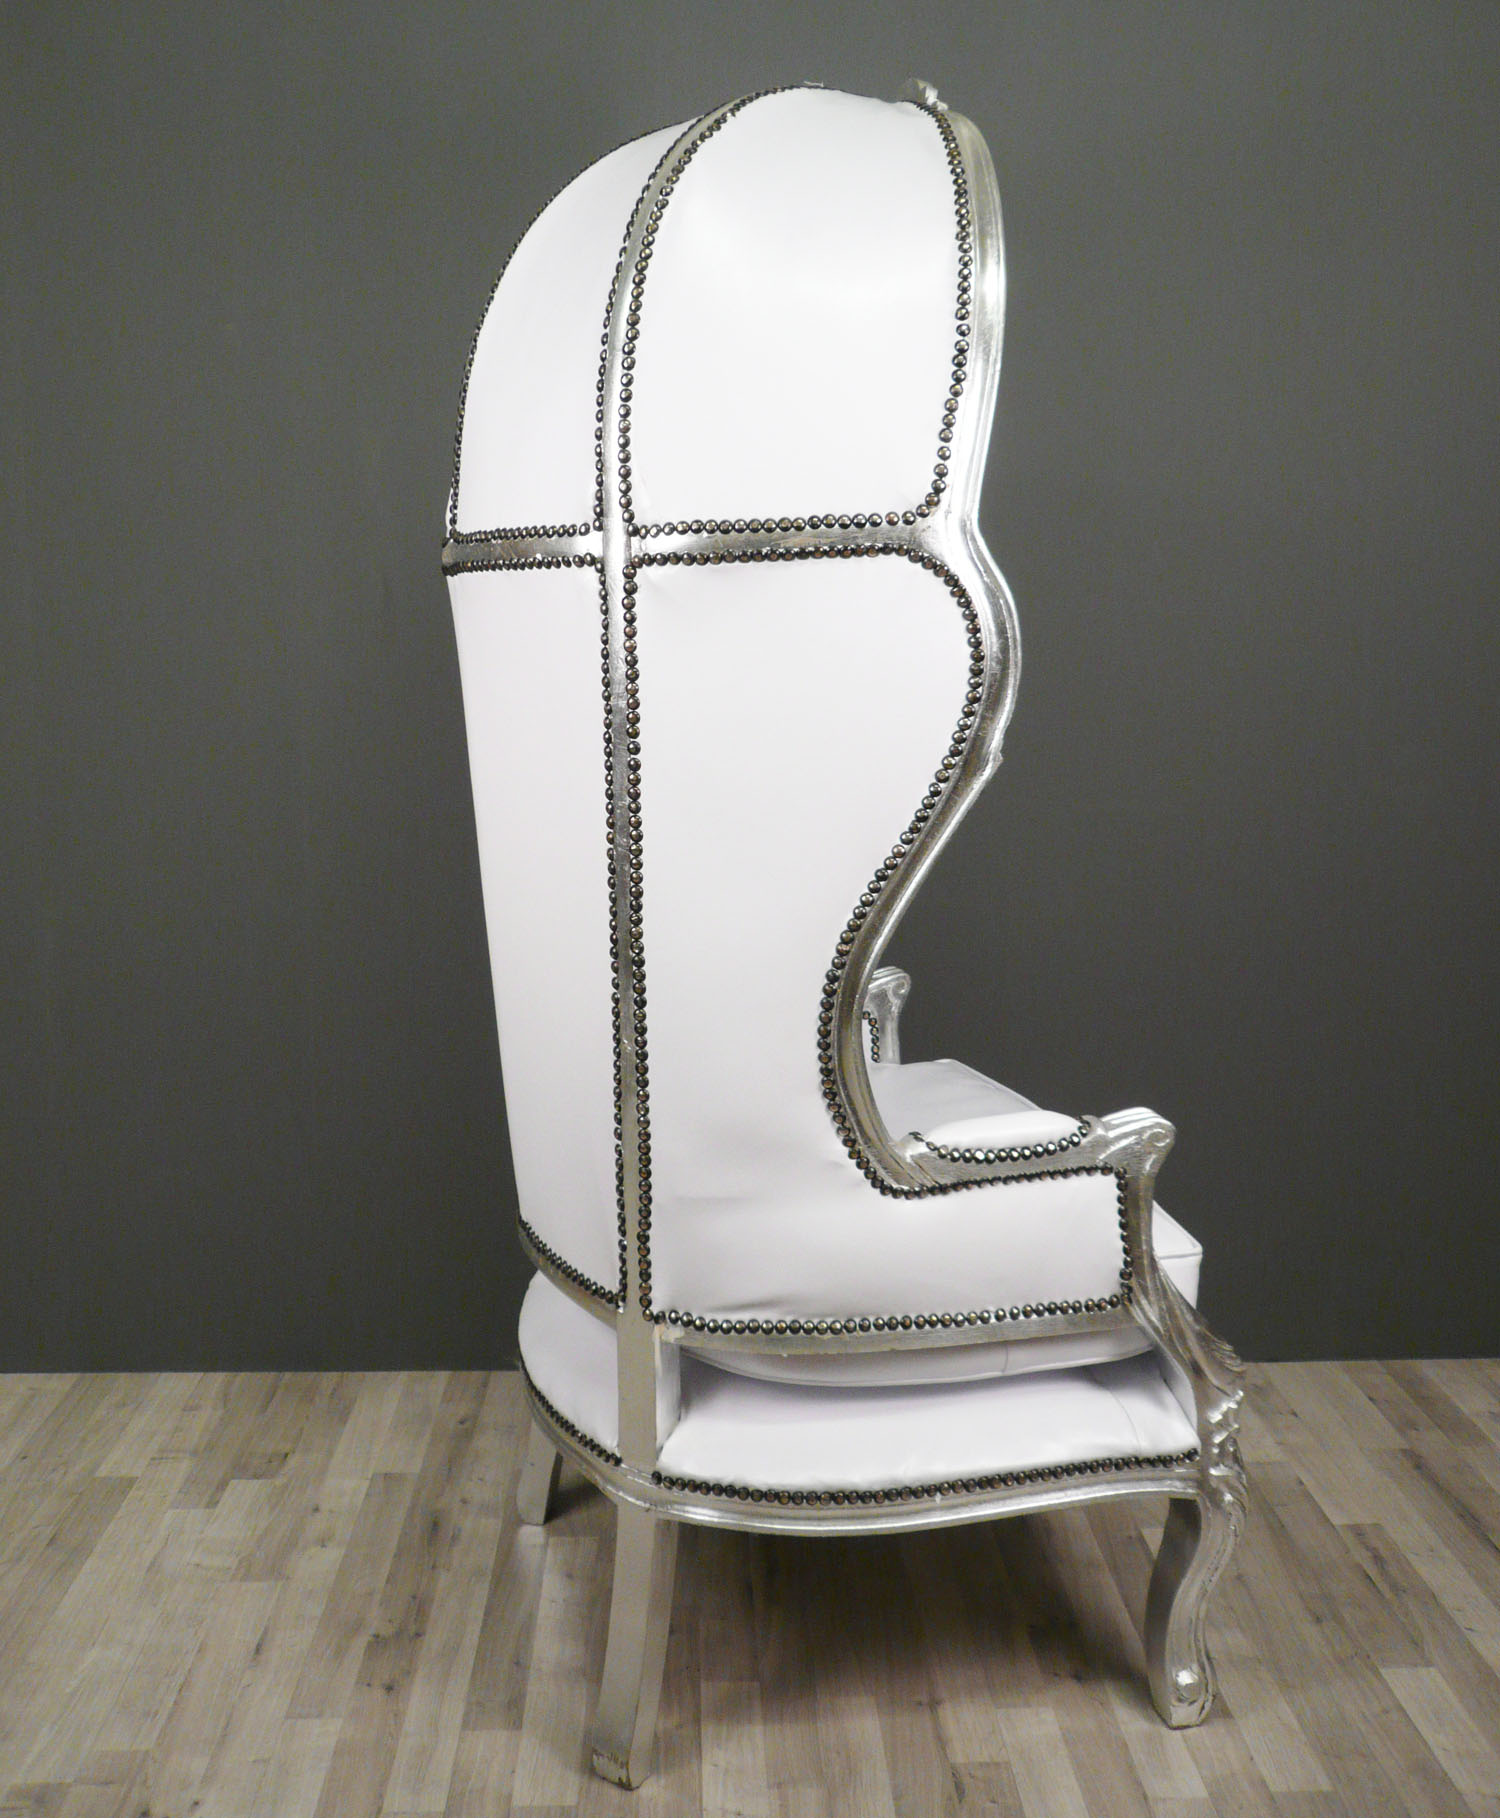 fauteuil baroque carrosse blanc meuble baroque. Black Bedroom Furniture Sets. Home Design Ideas